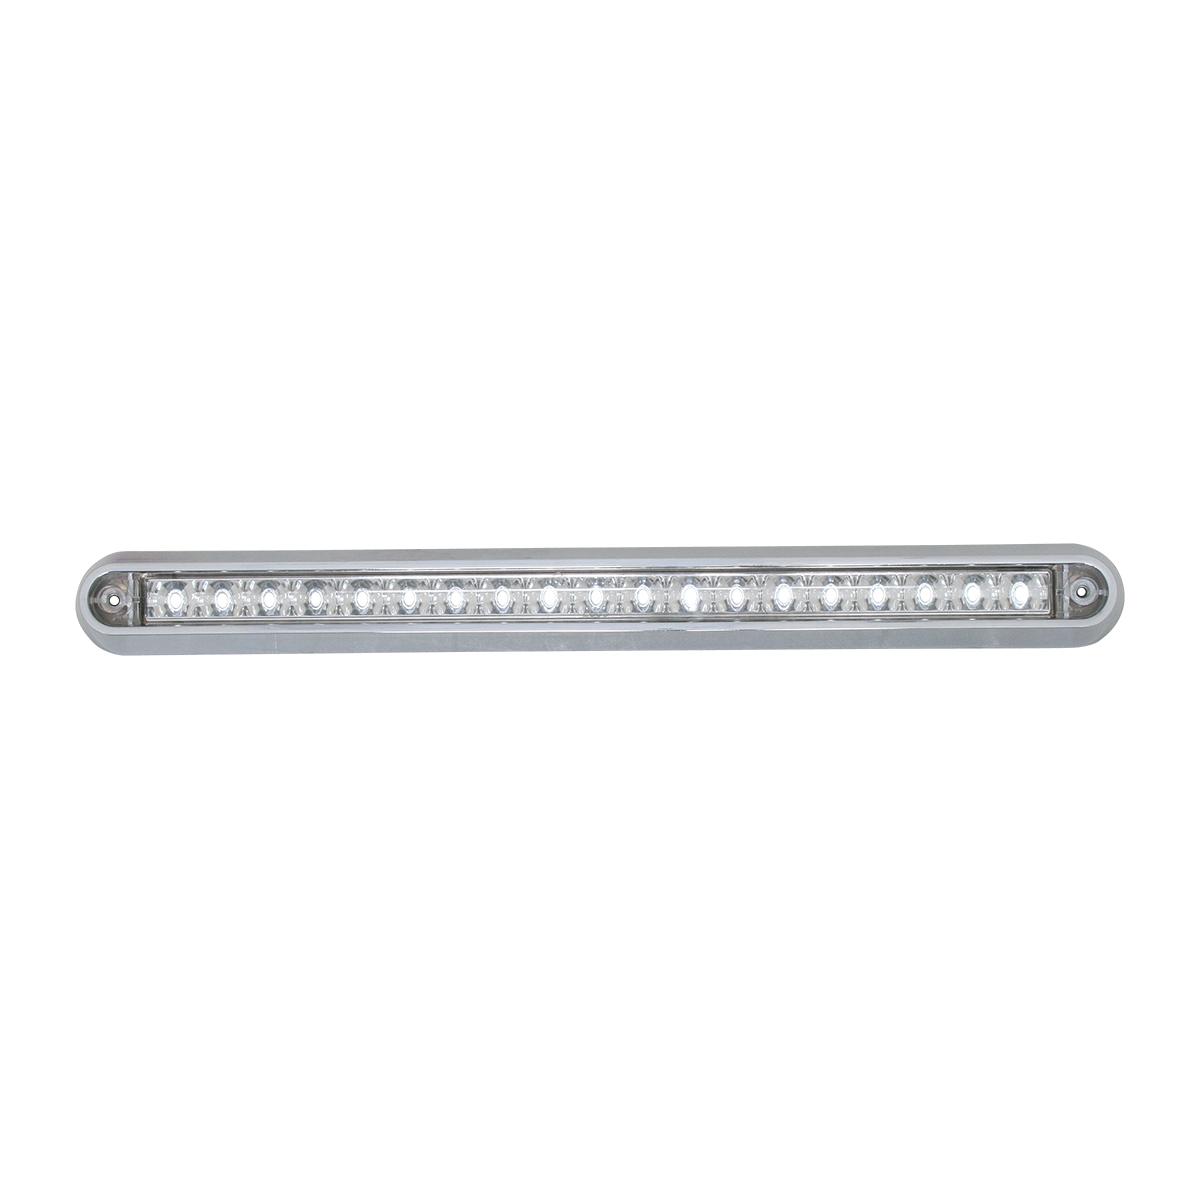 "76297 12"" Surface Mount Light Bar with Chrome Plastic Base"